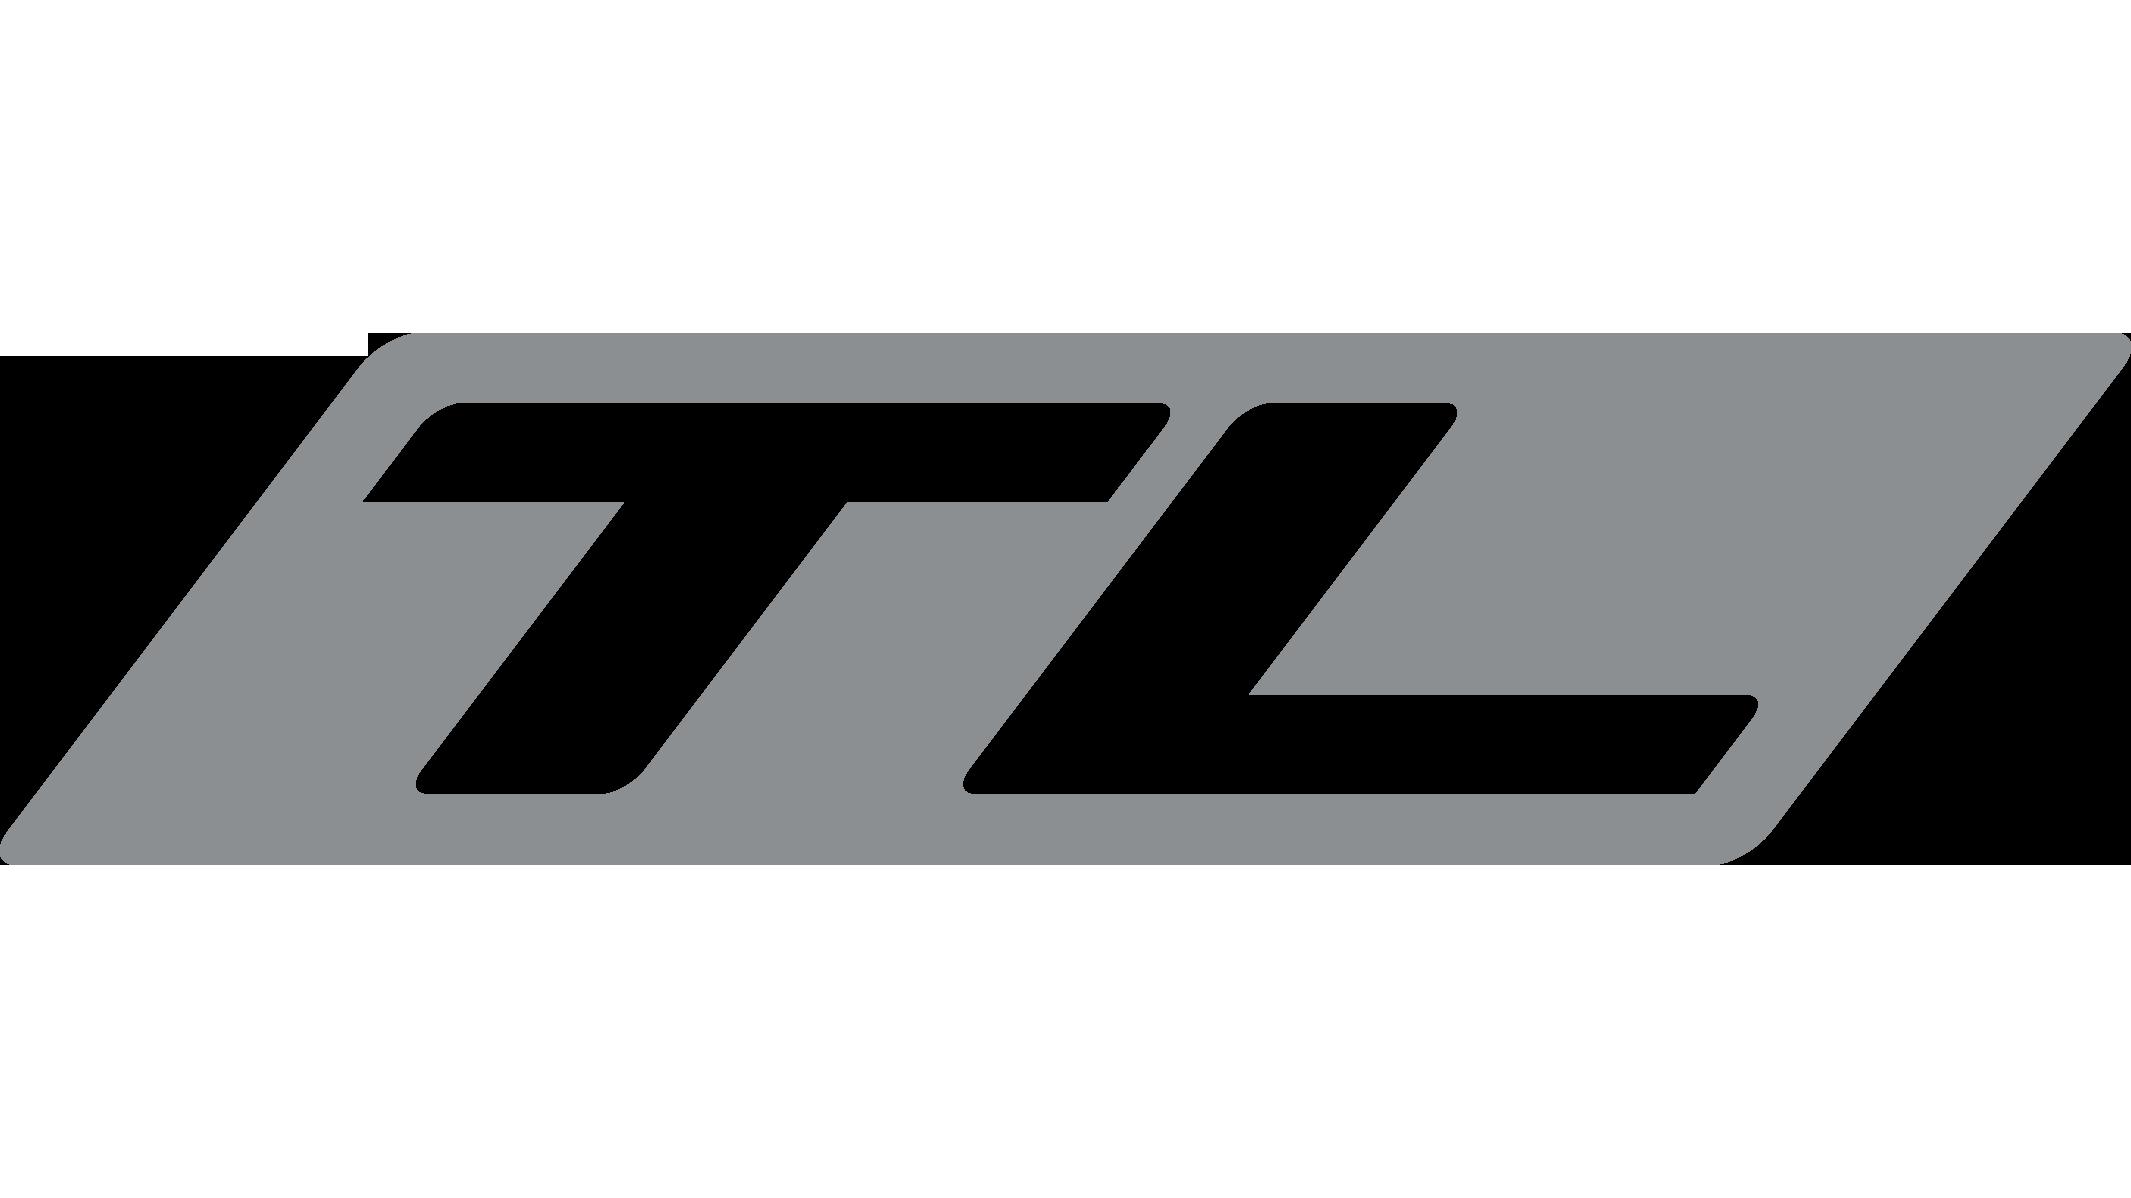 Tubeless logo